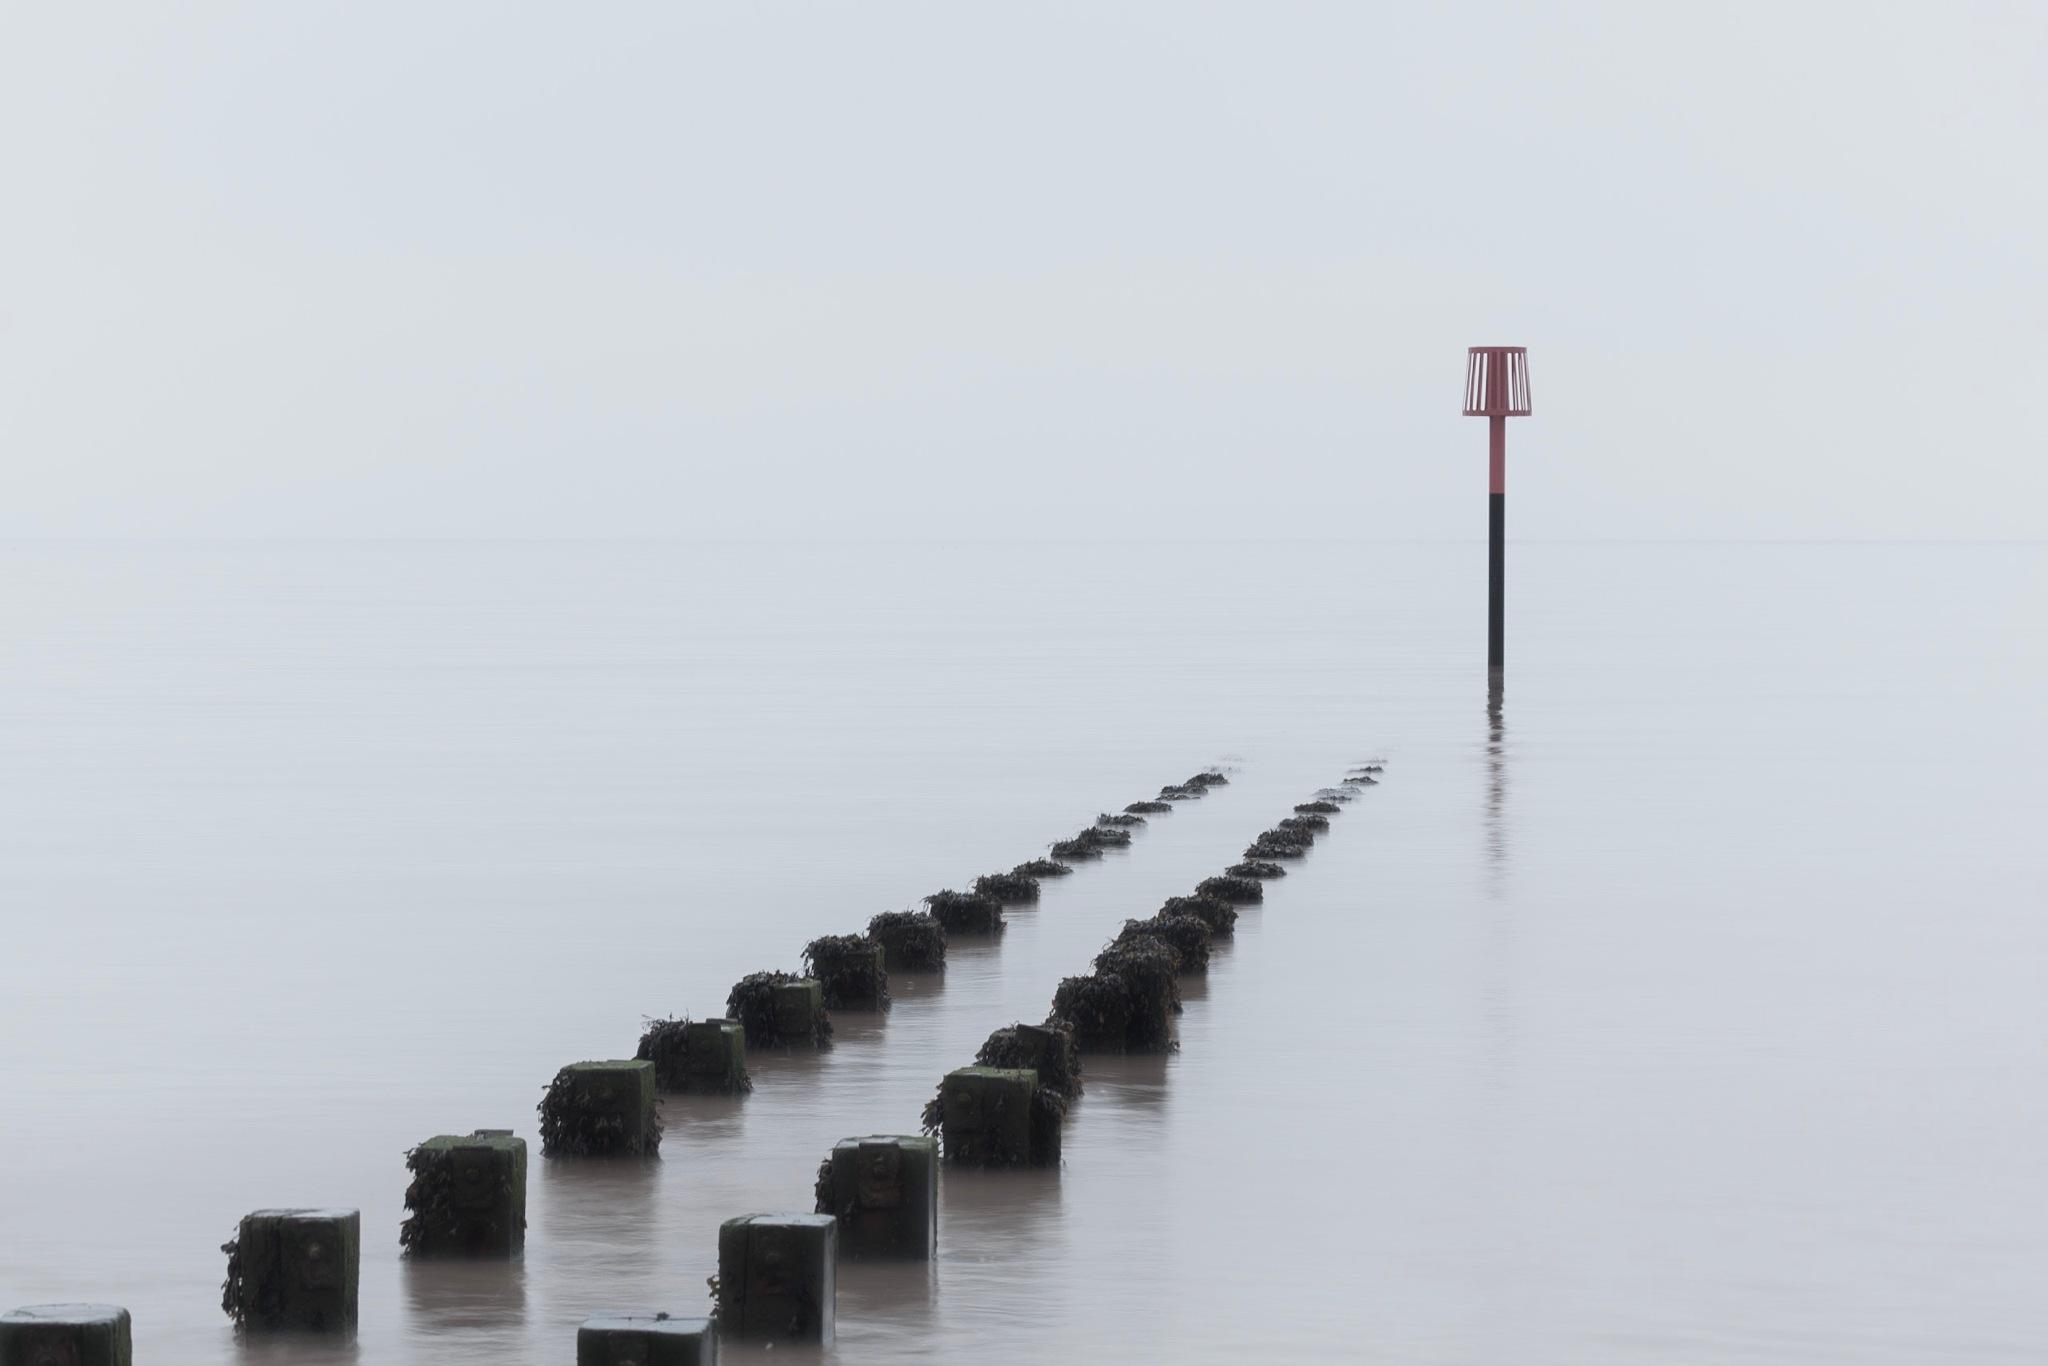 Into the Fog  by Carl Mickleburgh